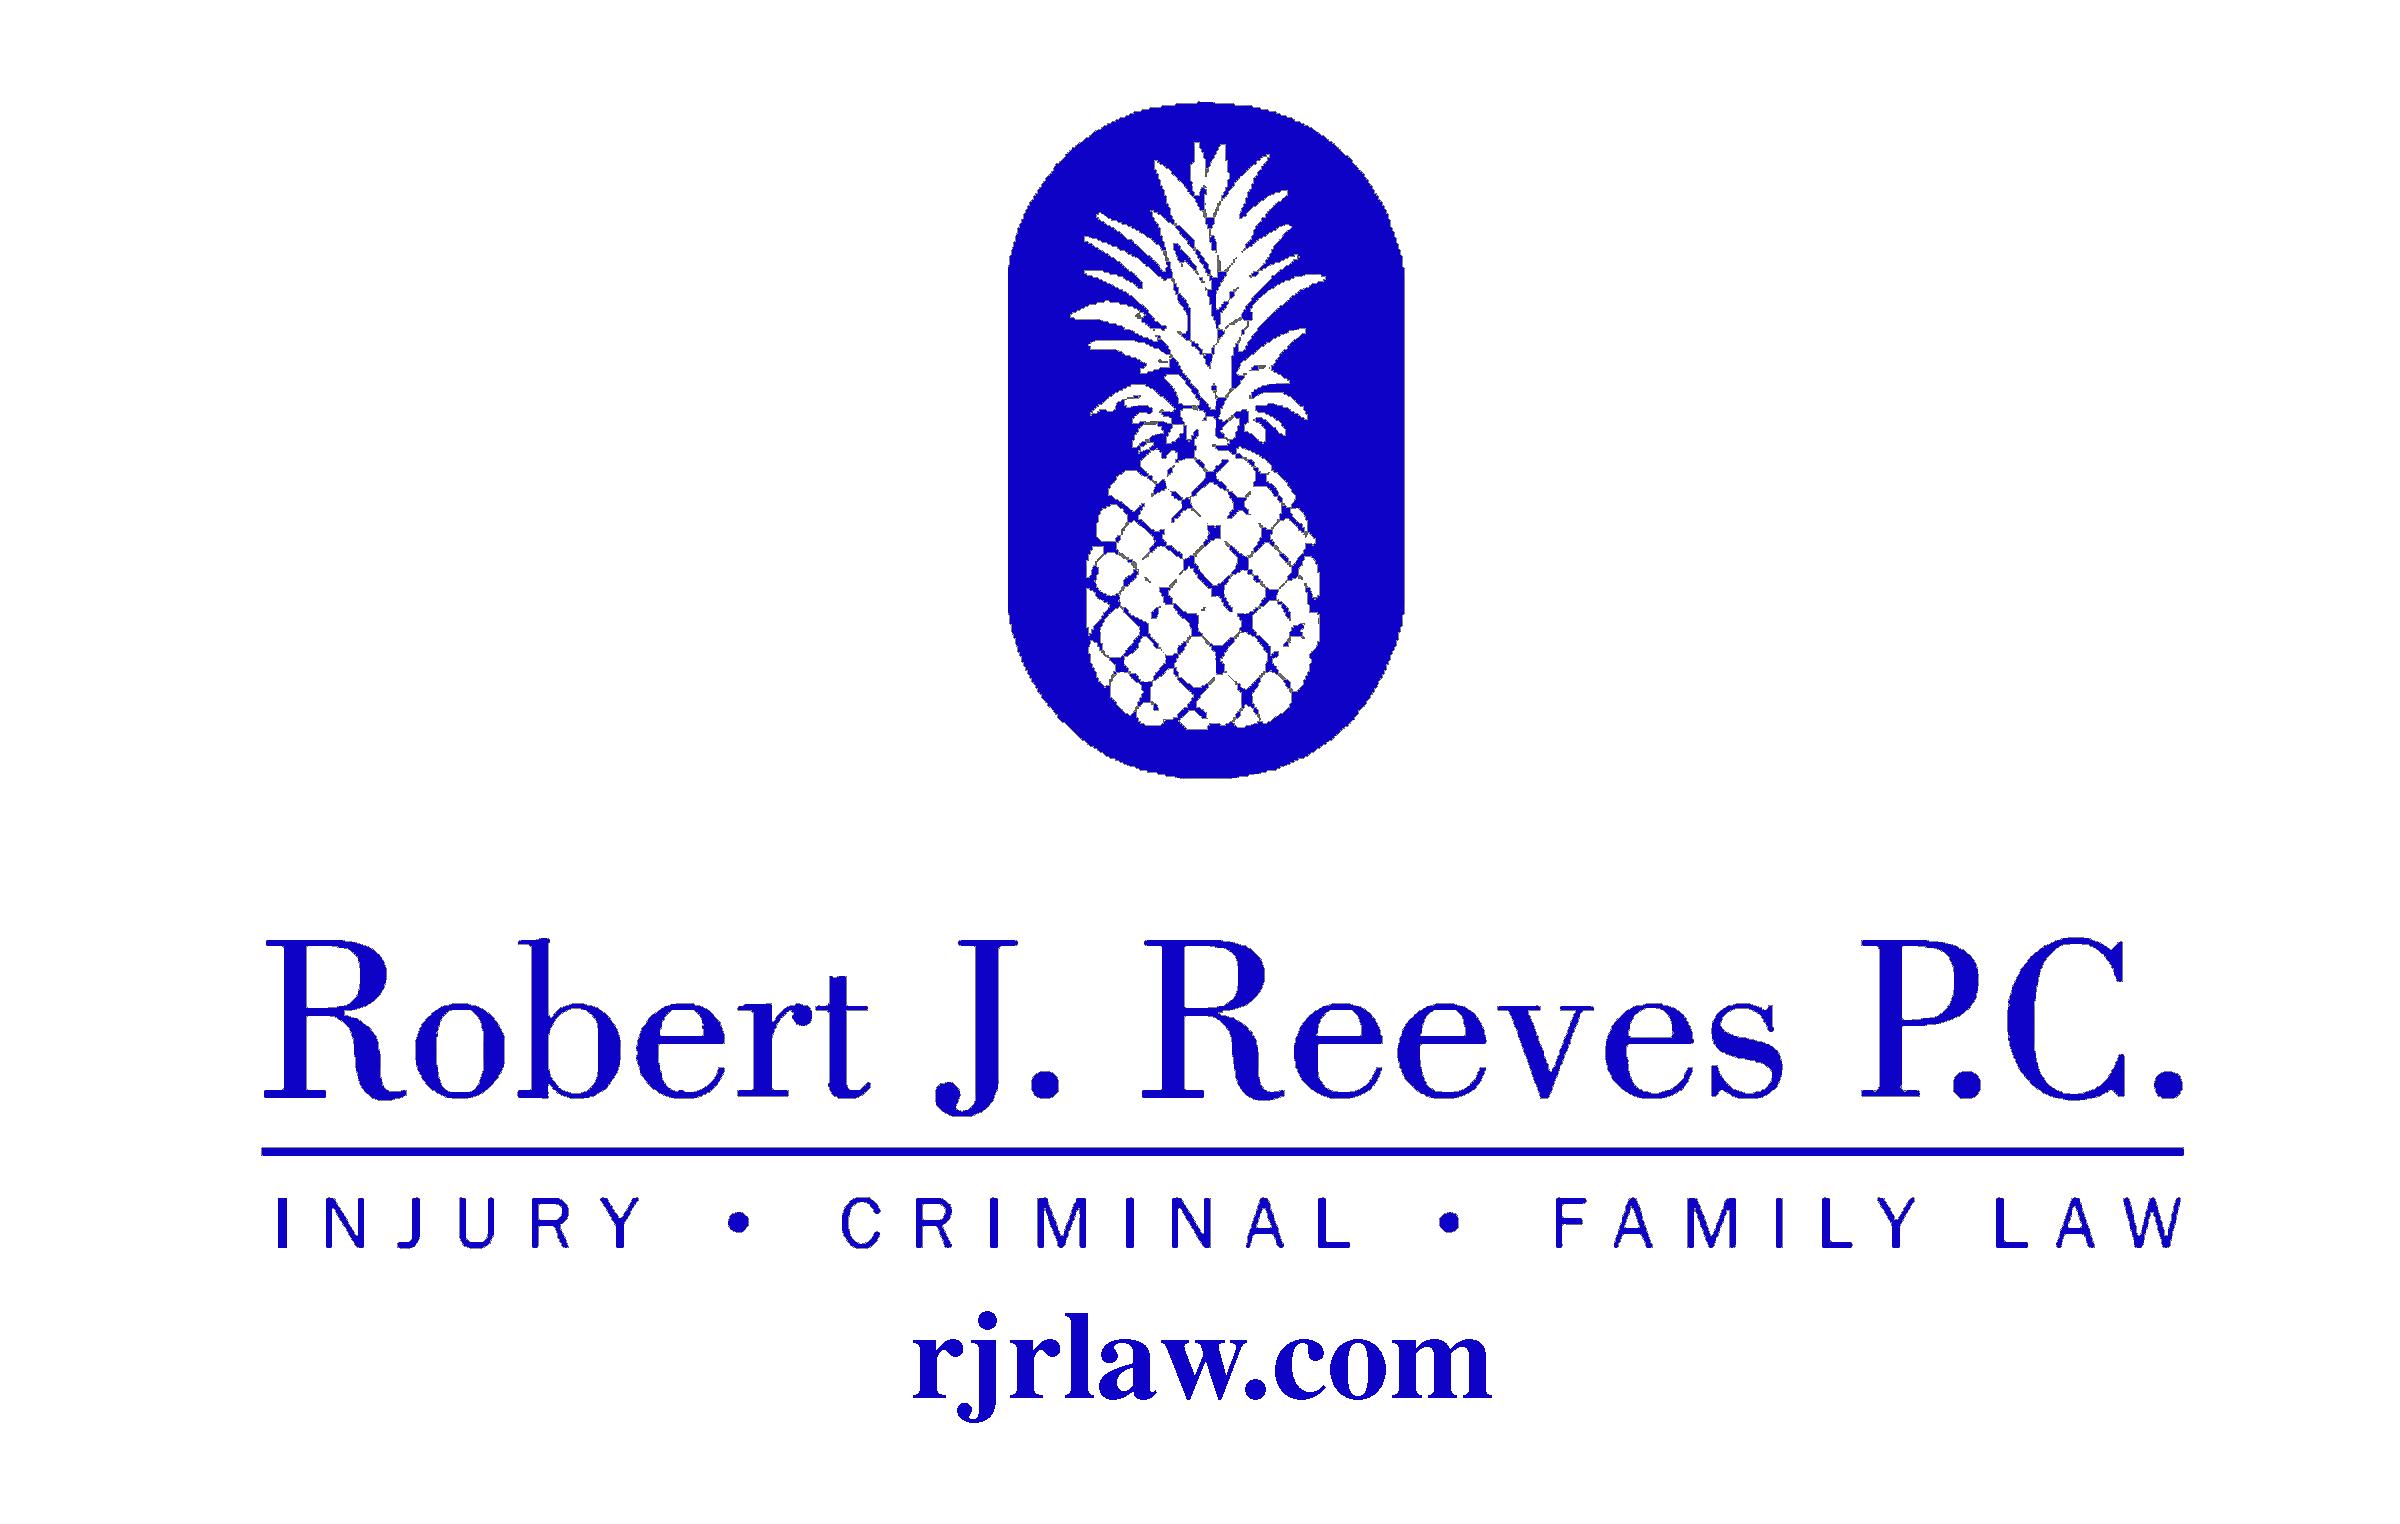 Robert J Reeves P.C. reviews | Criminal Defense Law at 1012 Market Street - Fort Mill SC